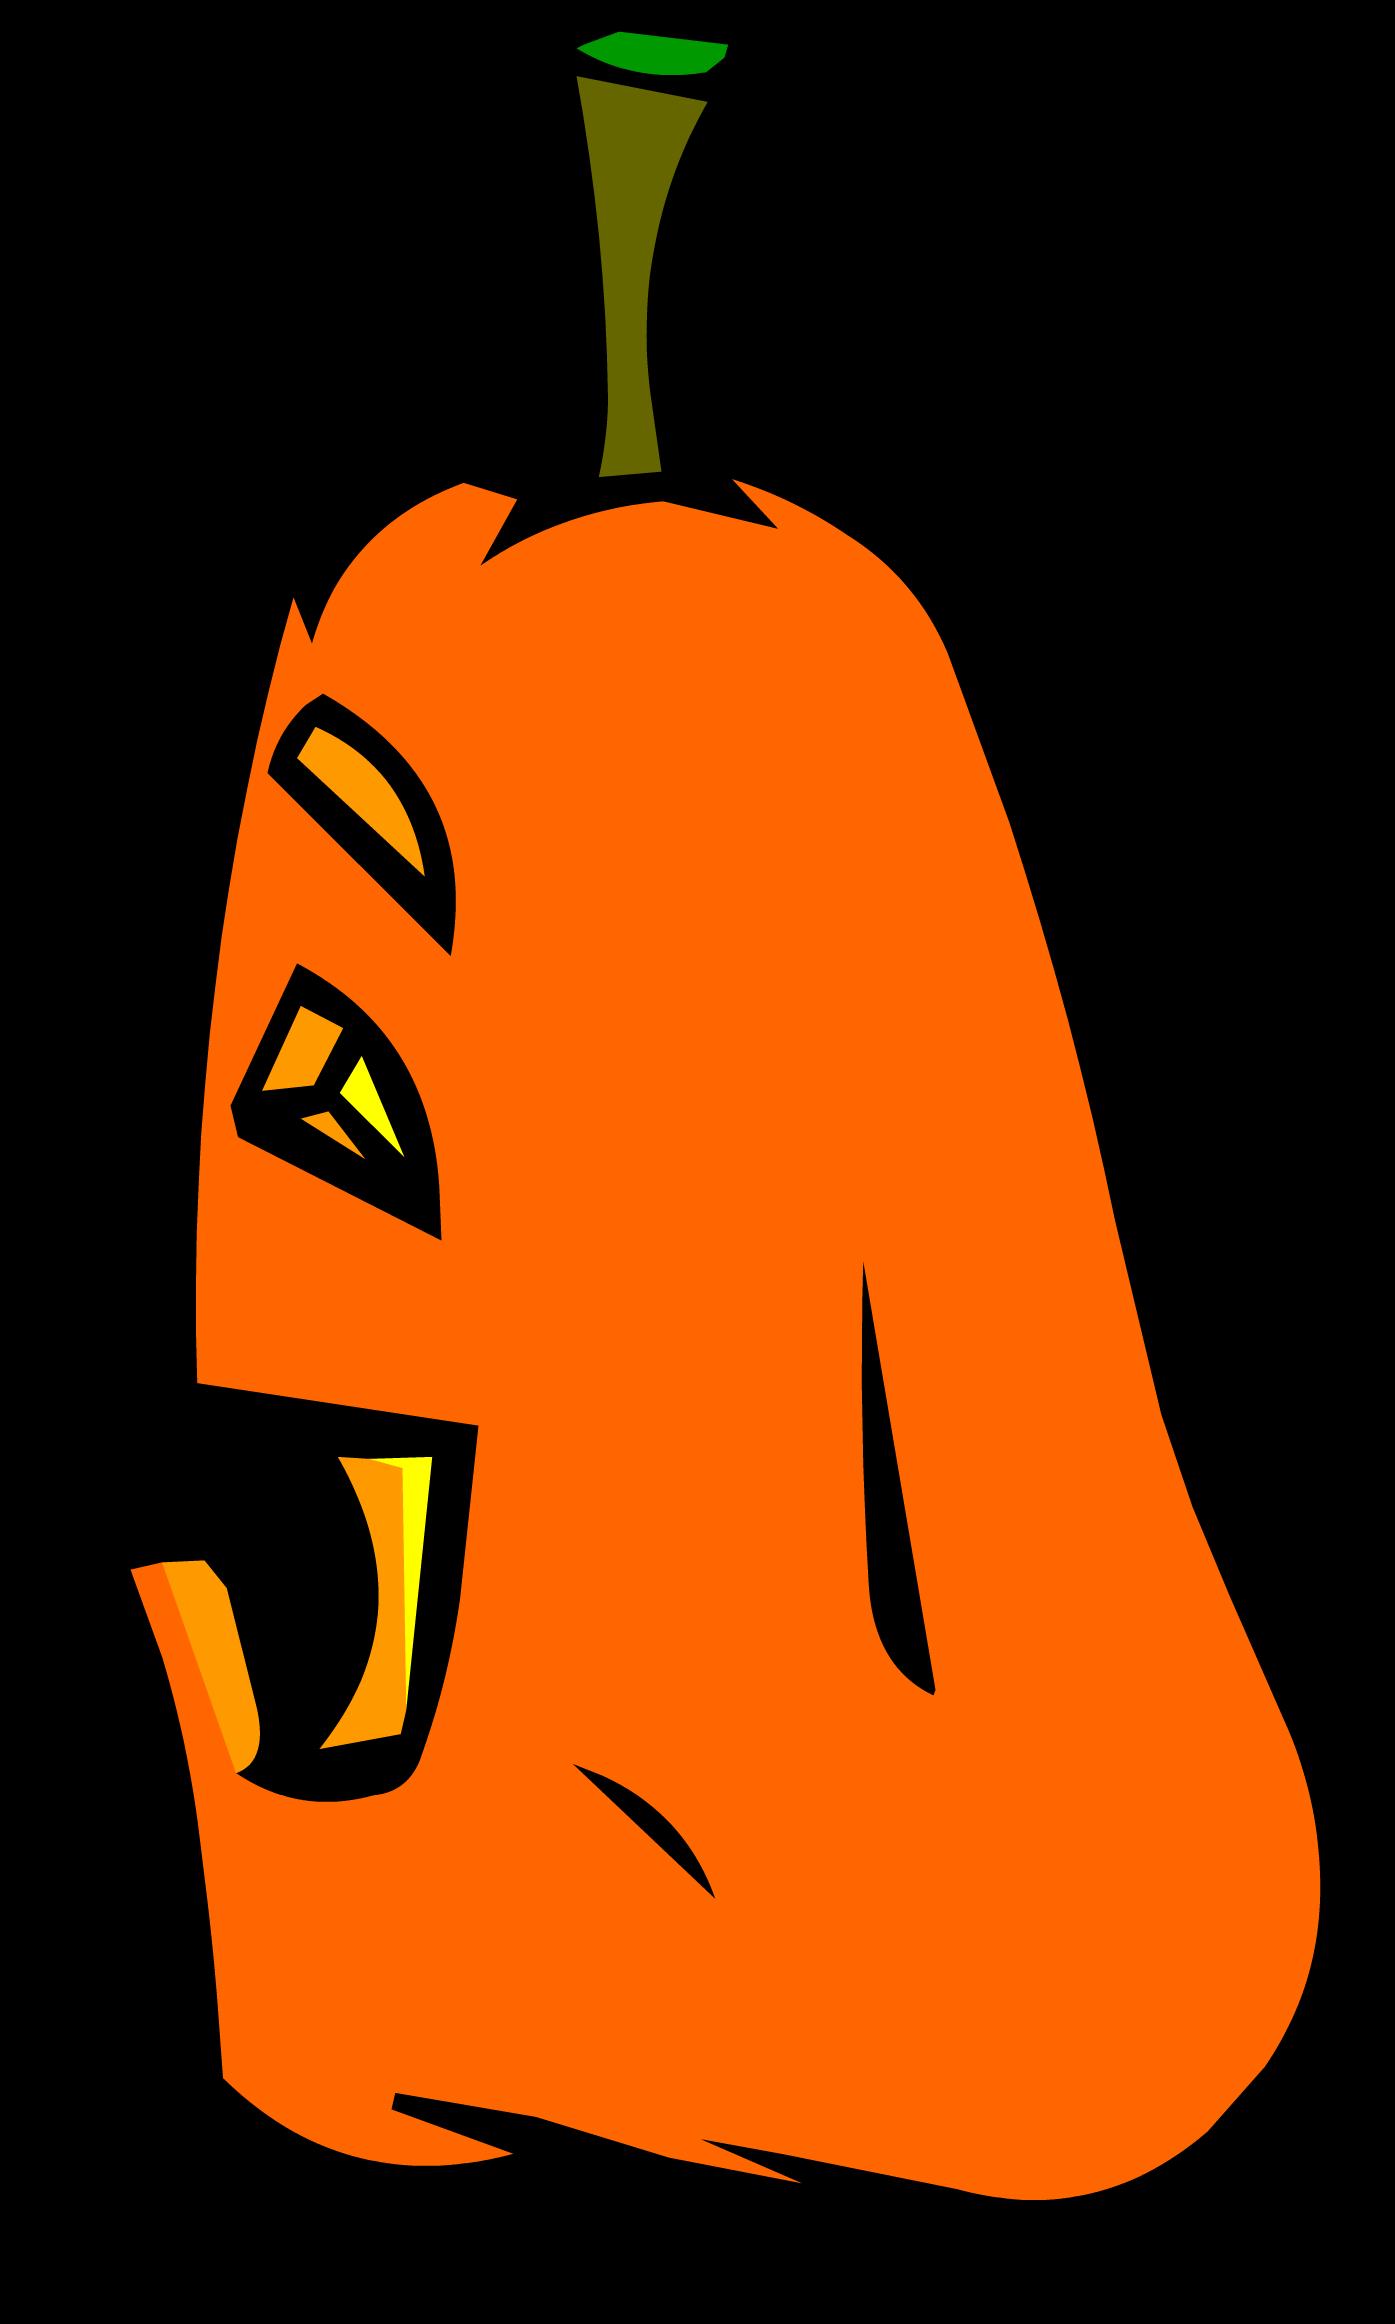 Pumpkin clipart jack o lantern sprite picture free library Image - Goofy Jack-O-Lantern sprite 003.png | Club Penguin Wiki ... picture free library